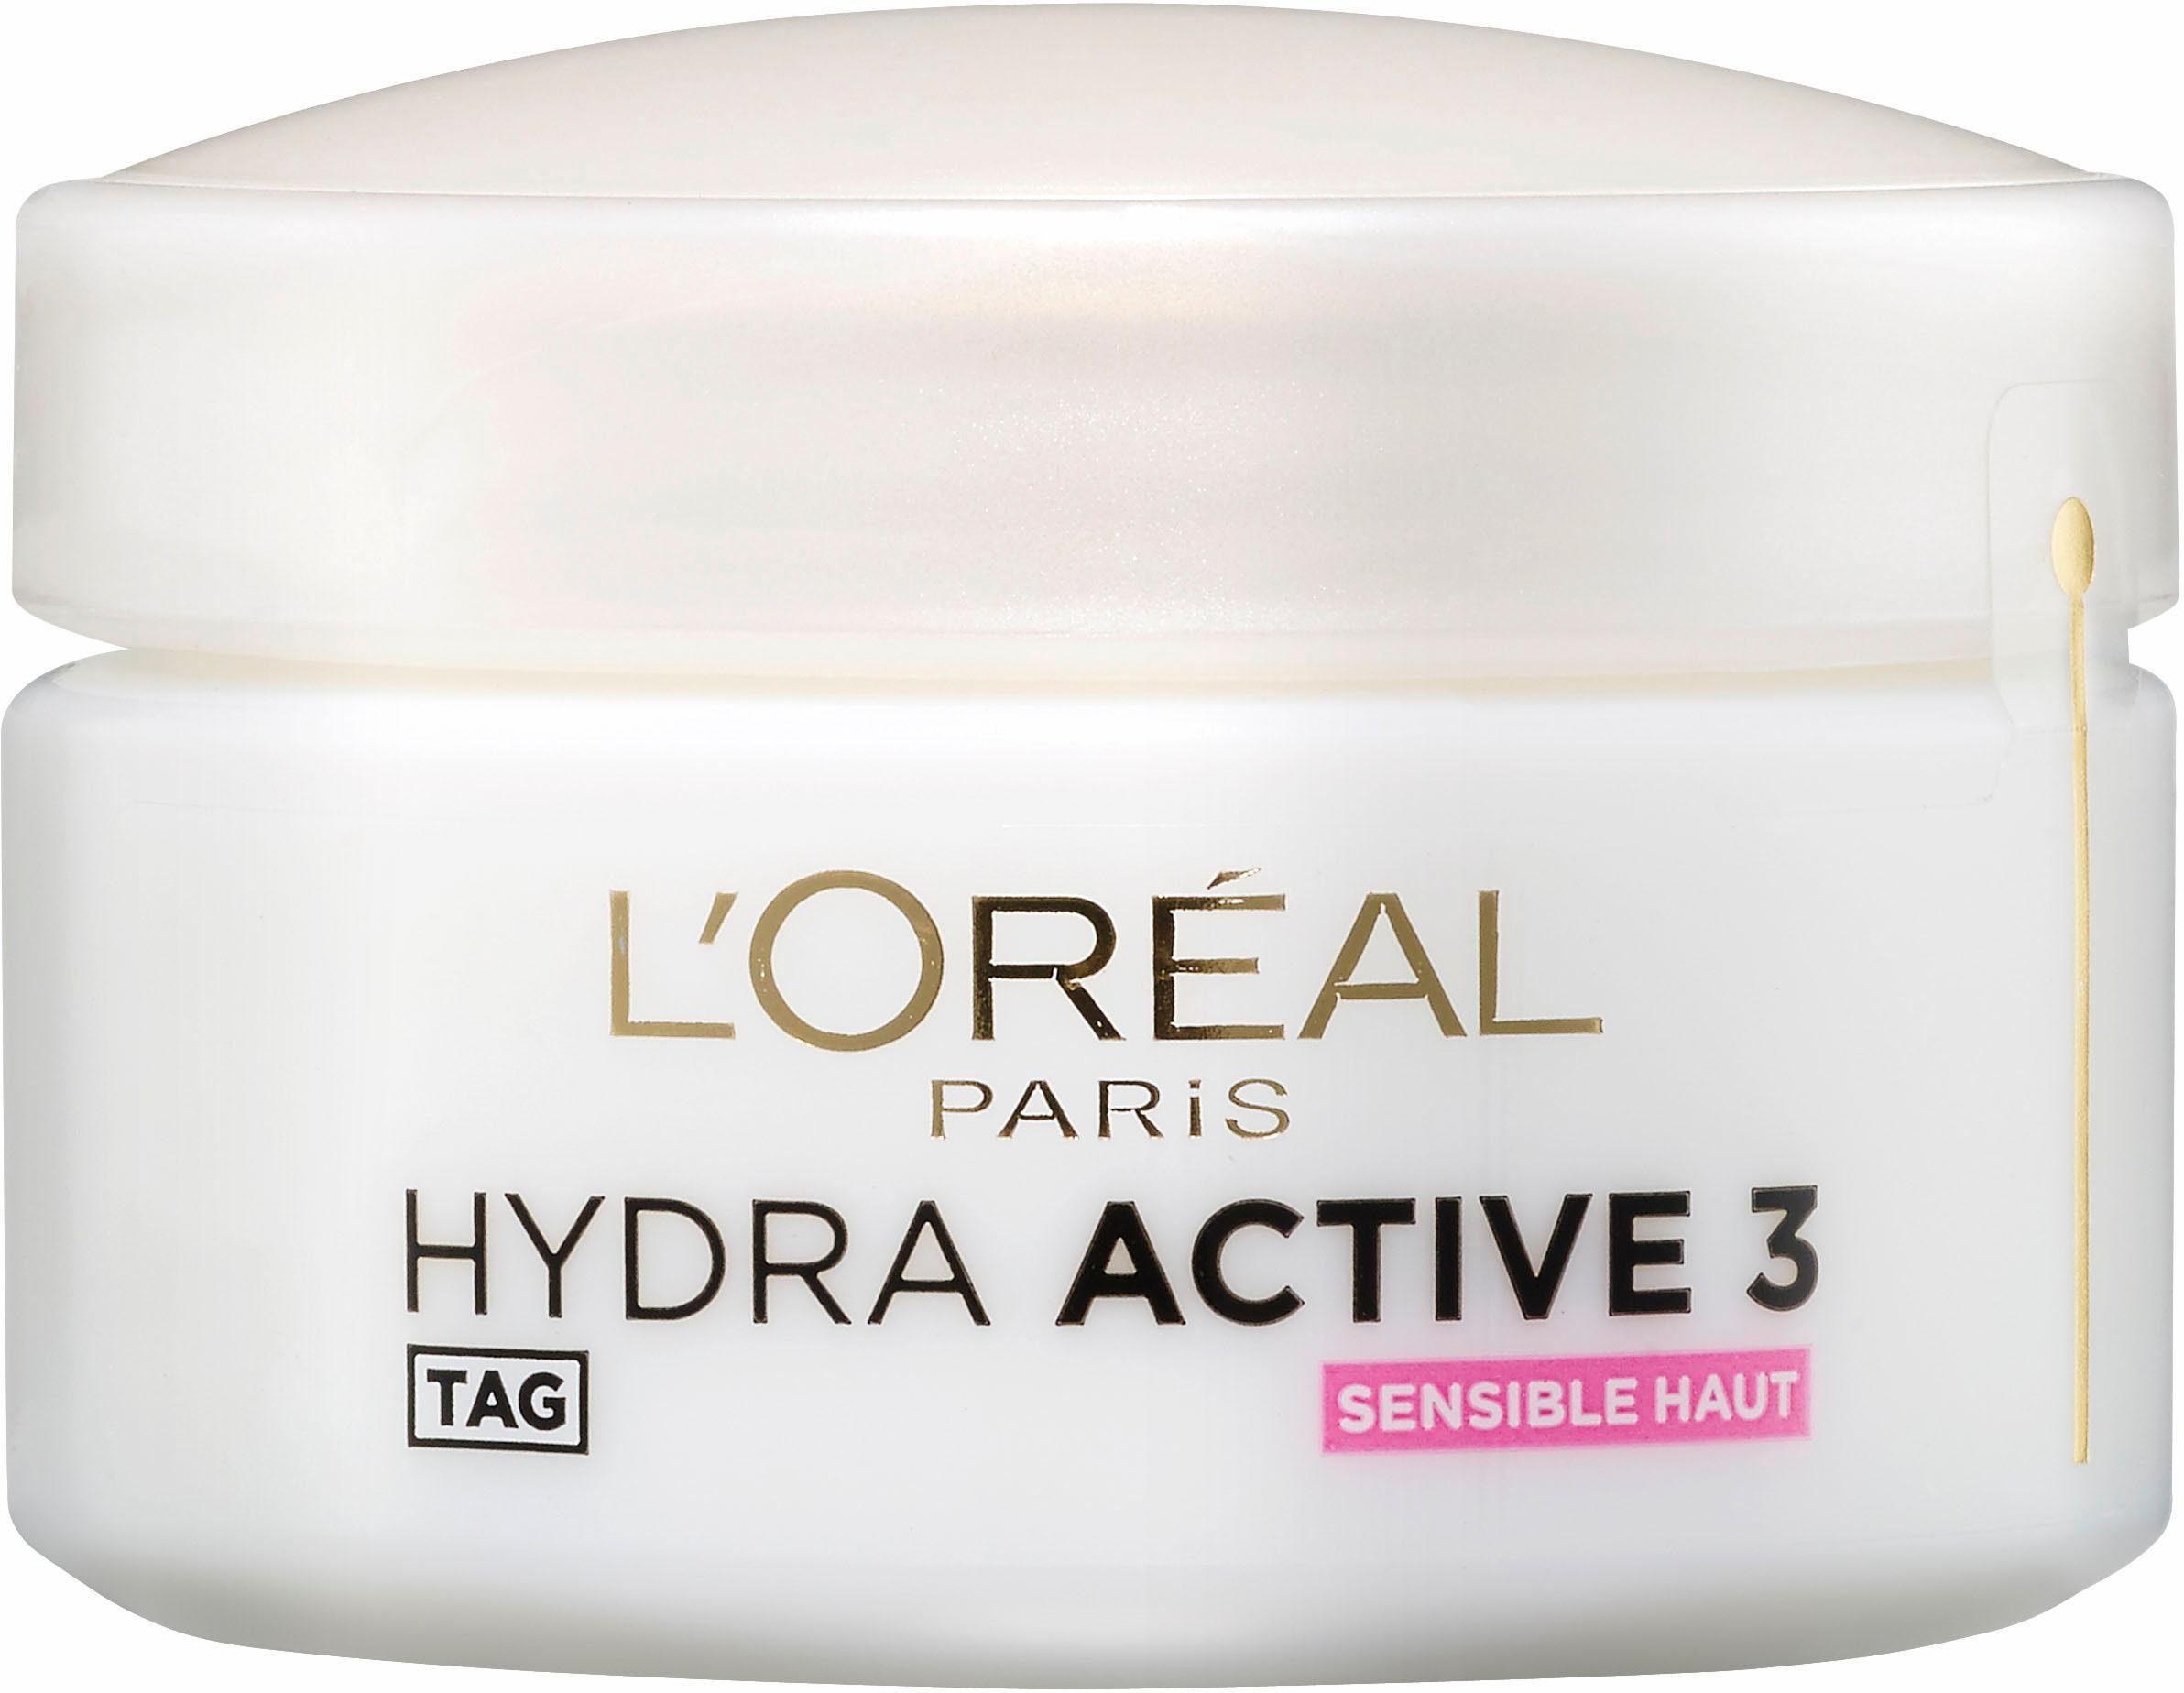 L'Oréal Paris, »Hydra Active 3 sehr trockene und sensible Haut«, Gesichtspflege